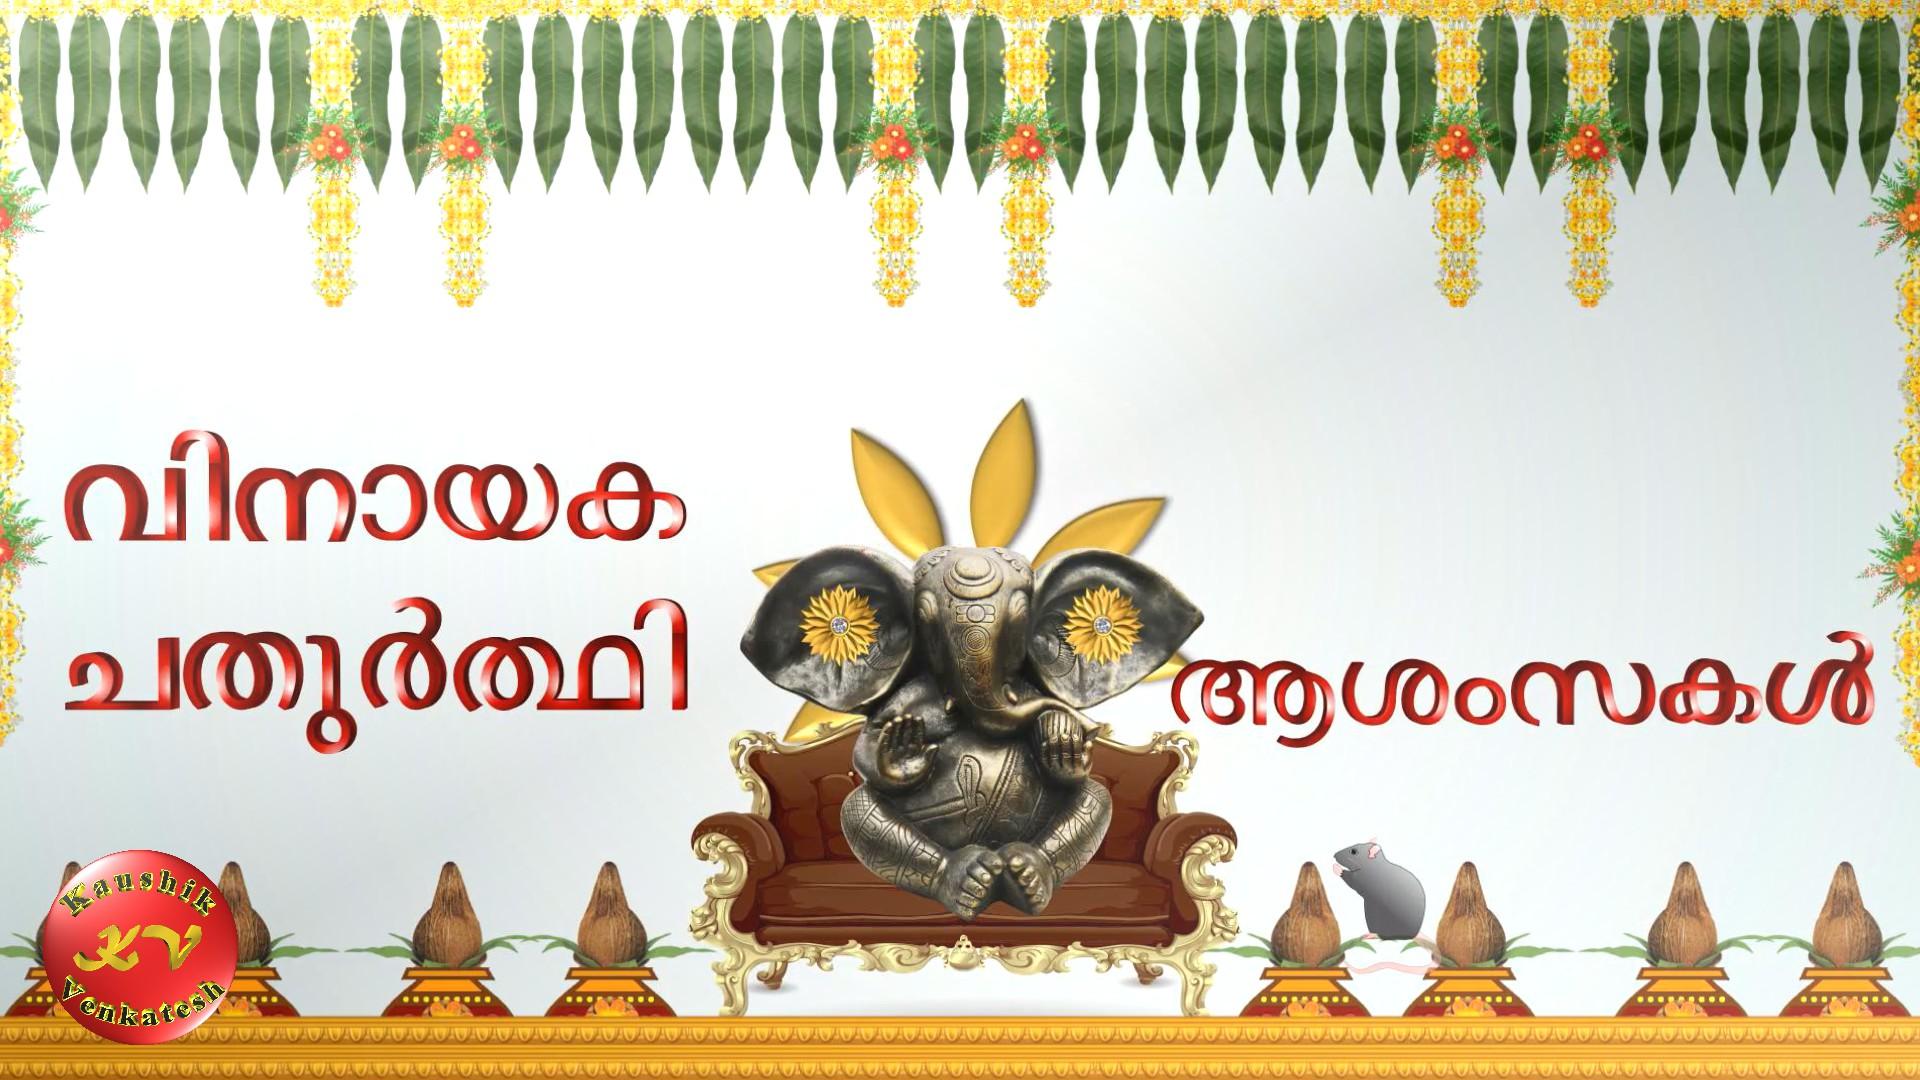 Greetingss for Ganesh Chaturthi festival (Malayalam font)